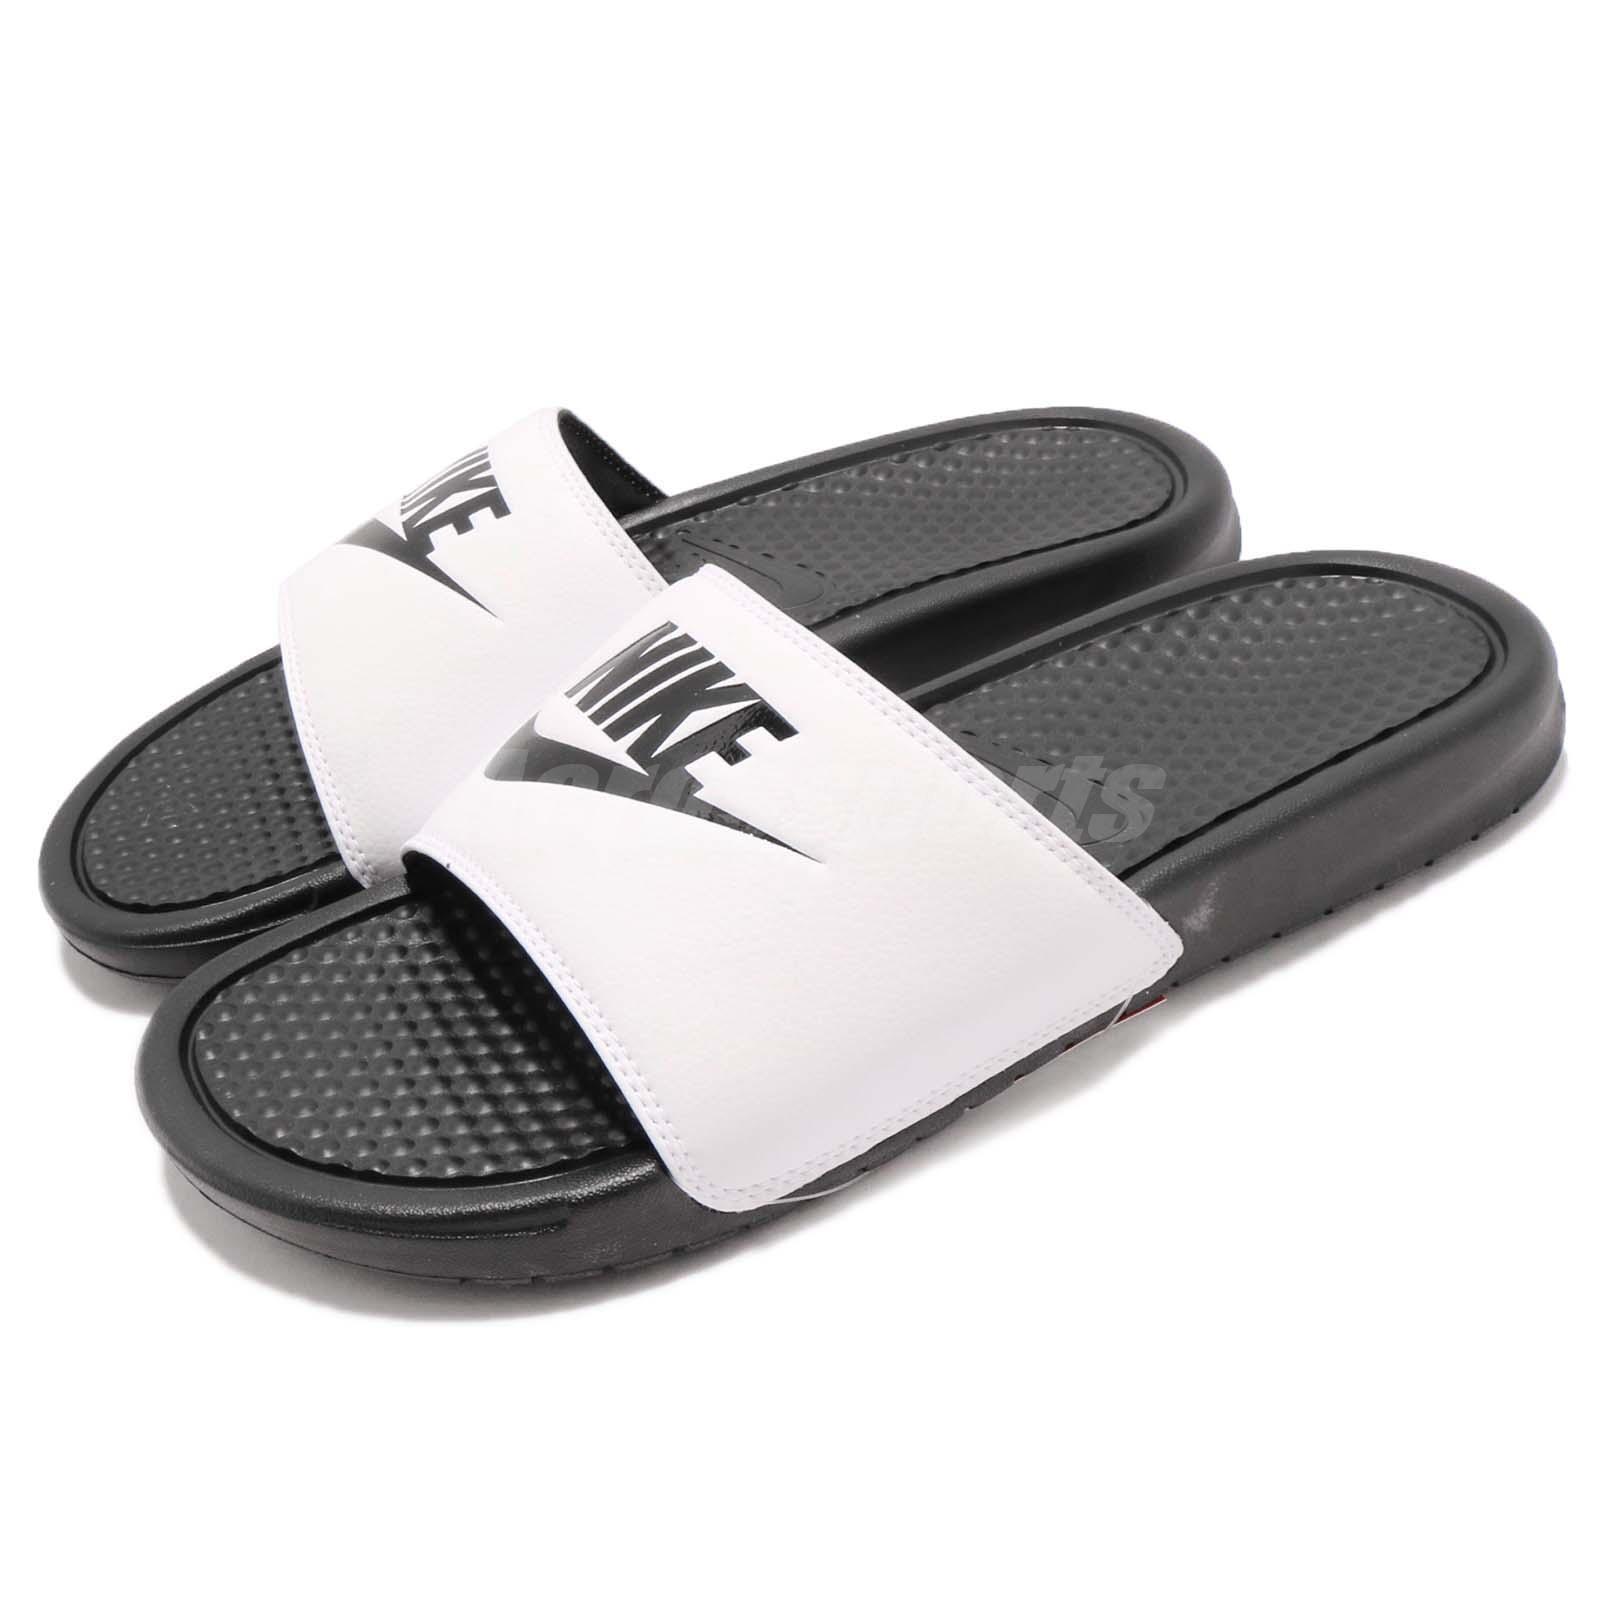 Nike Benassi JDI LOGO Sandal Blanco Negro Hombre Deportes Sandal LOGO Slides Slippers 3438802018 0e8c90